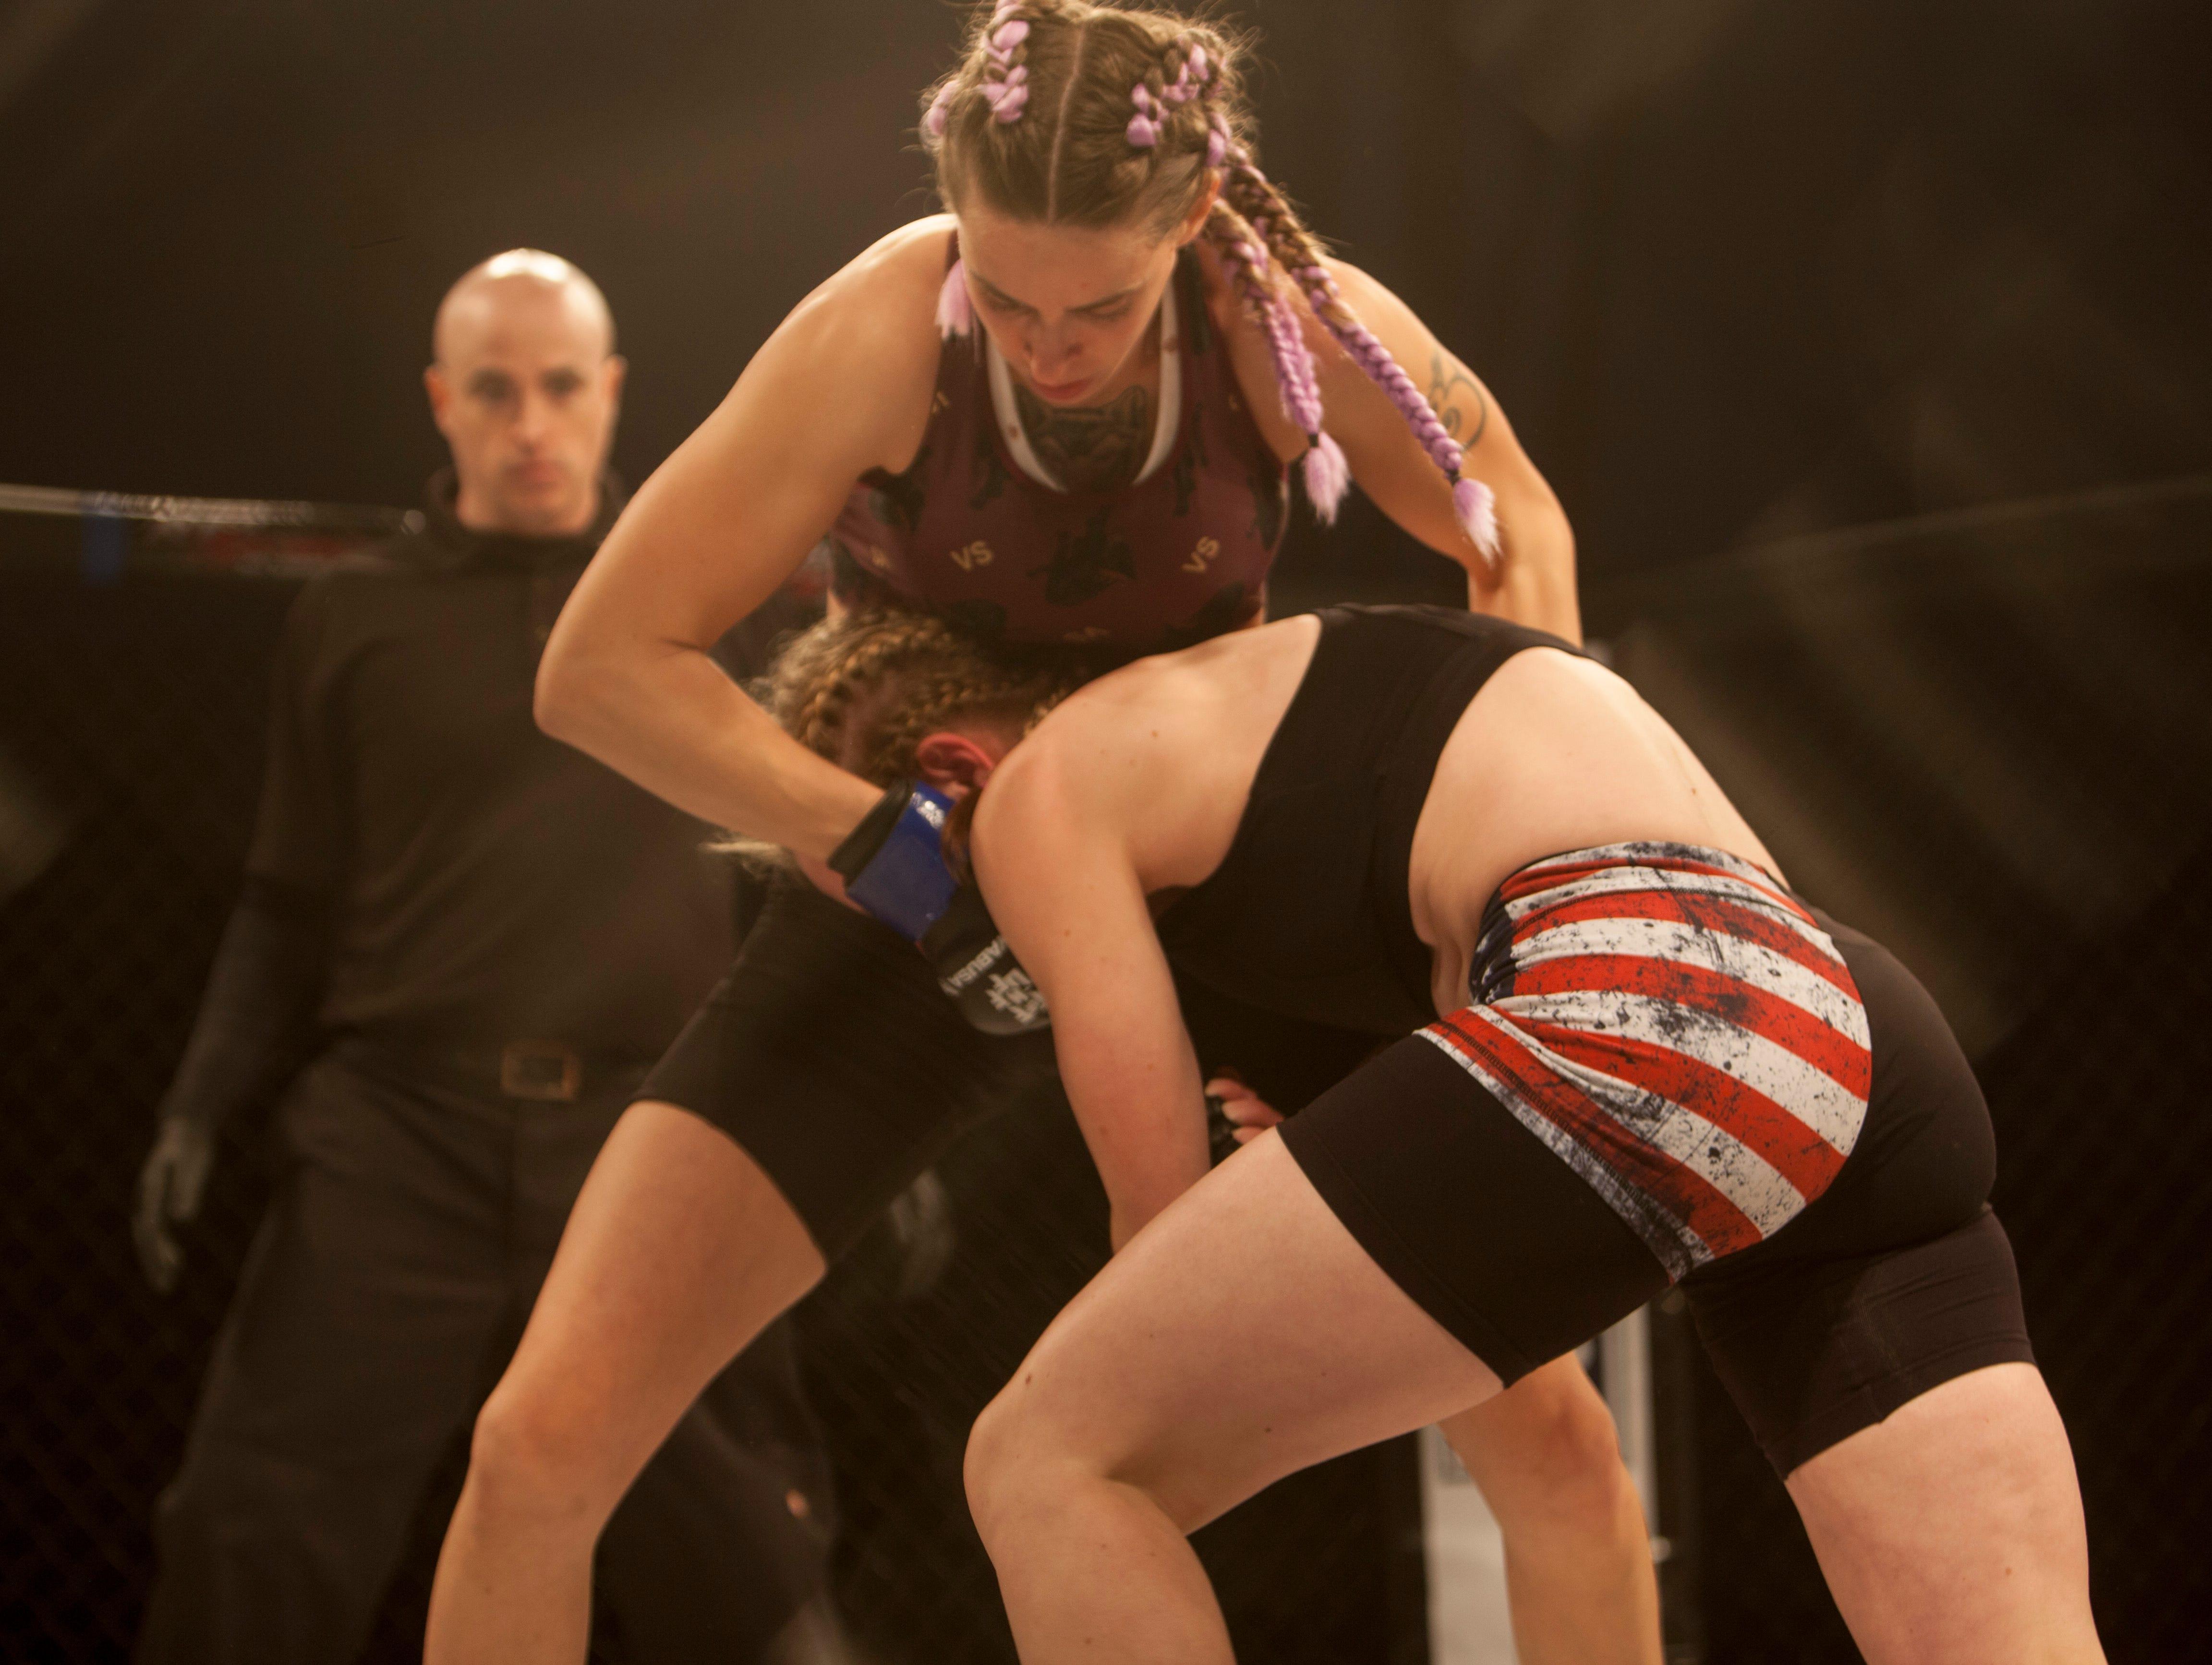 Kaycee Pearce, in the red corner, defeats Sadie Ault during Mayhem in Mesquite at the Casablanca Saturday, Dec. 15, 2018.